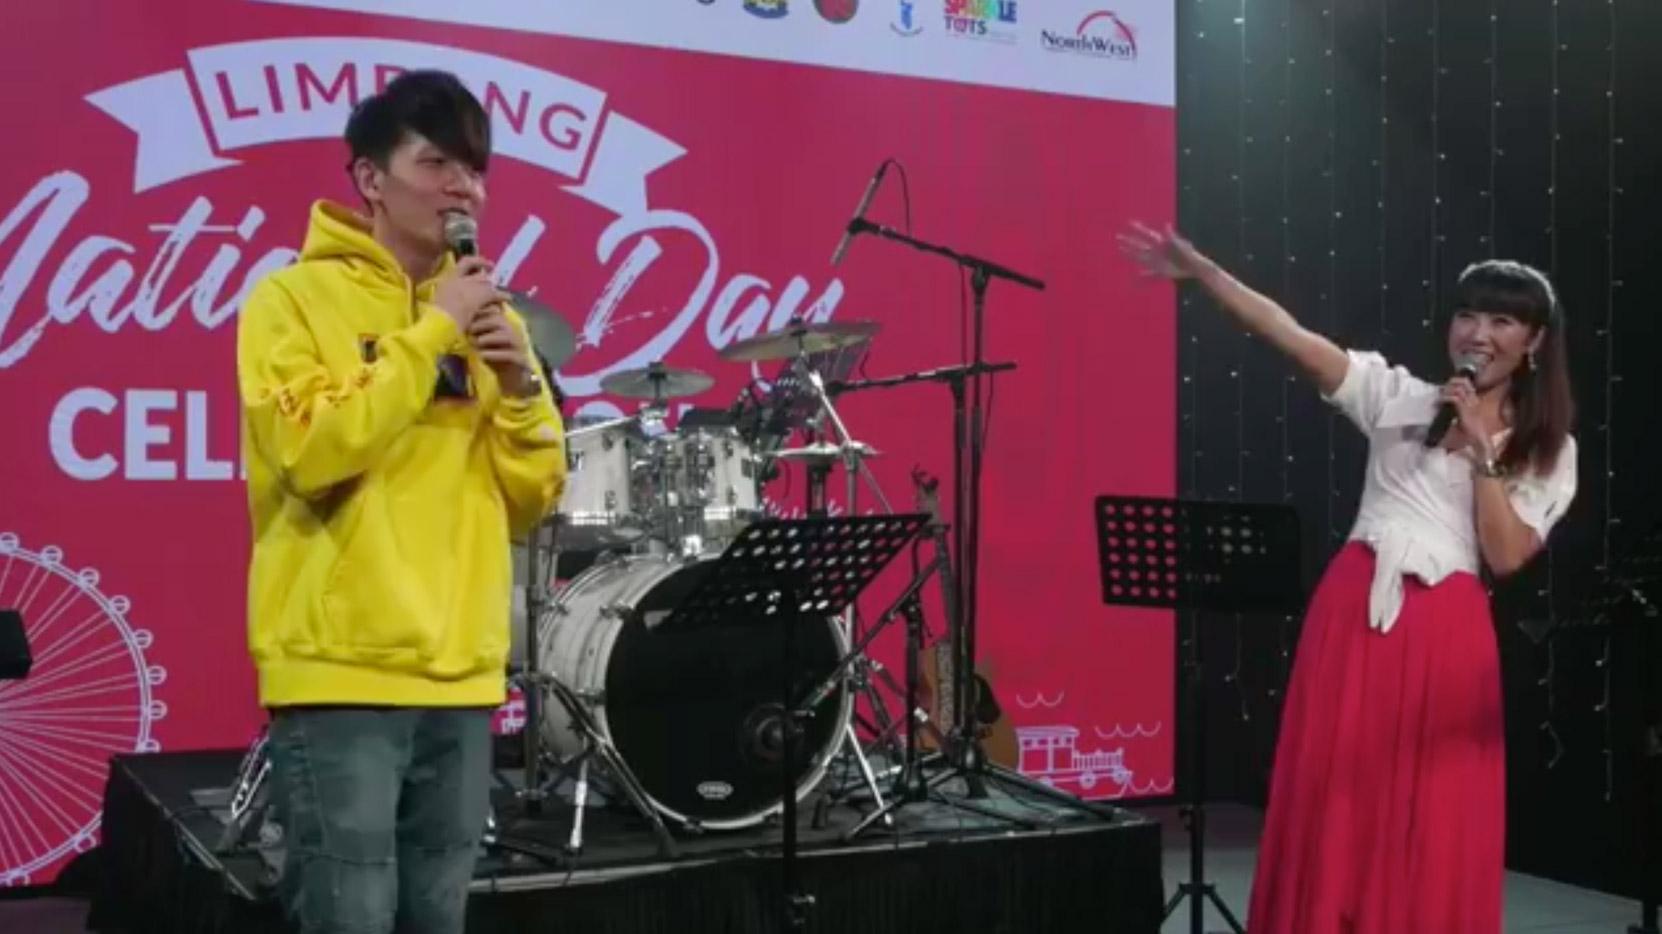 Limbang-national-day-celebration-virtual-event-singapore-community-event-event-company